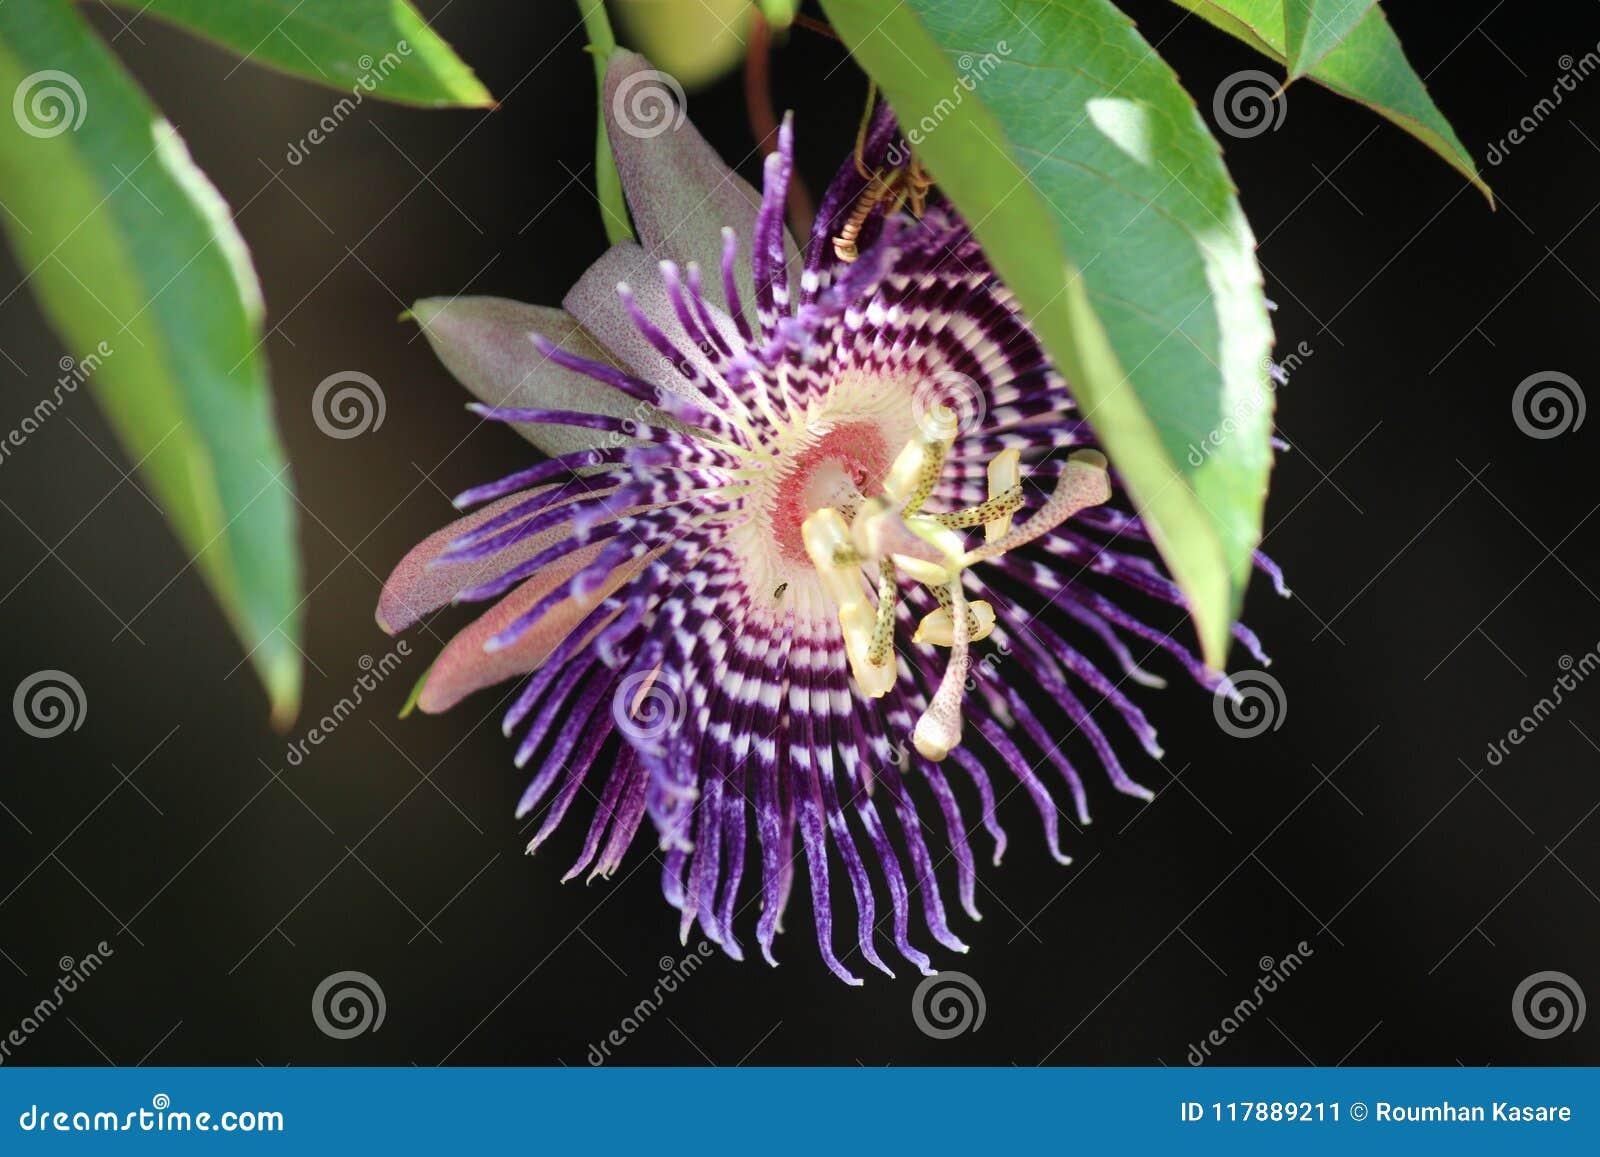 Beautiful And Rare Purple Flower Stock Image Image Of Flowersadd